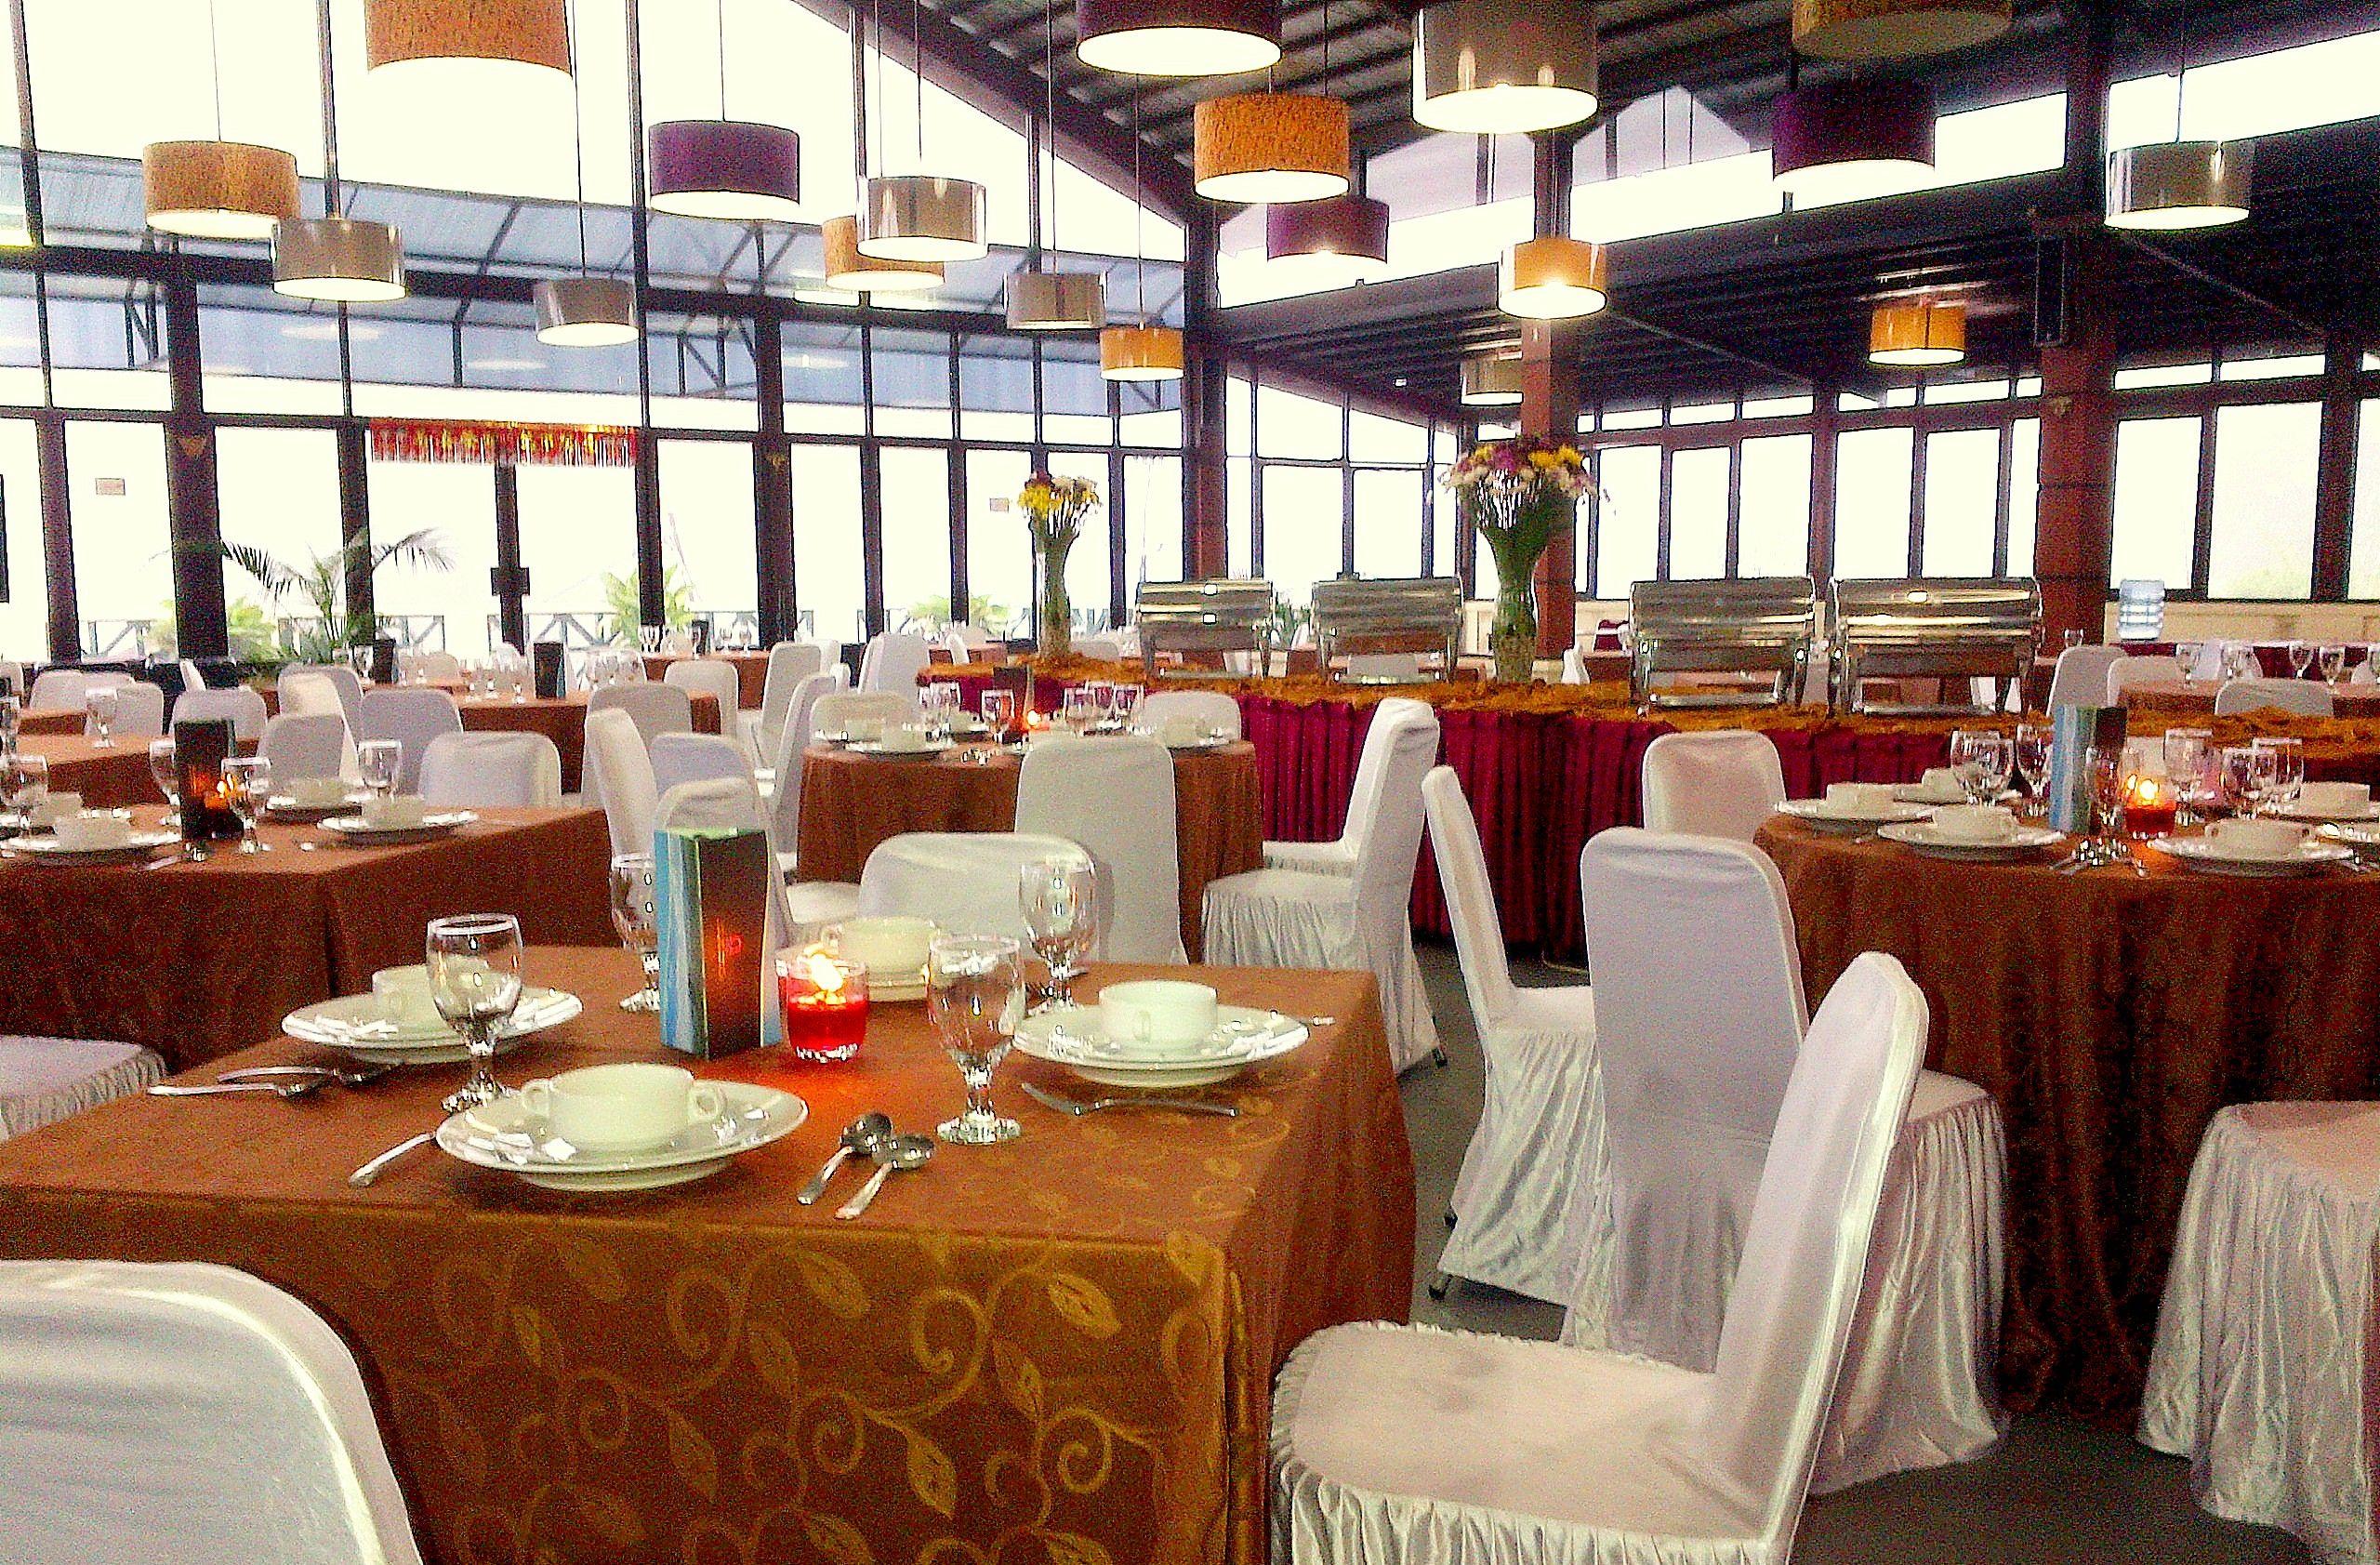 Alfa Resort Hotel & Conference Puncak,Cibuluh